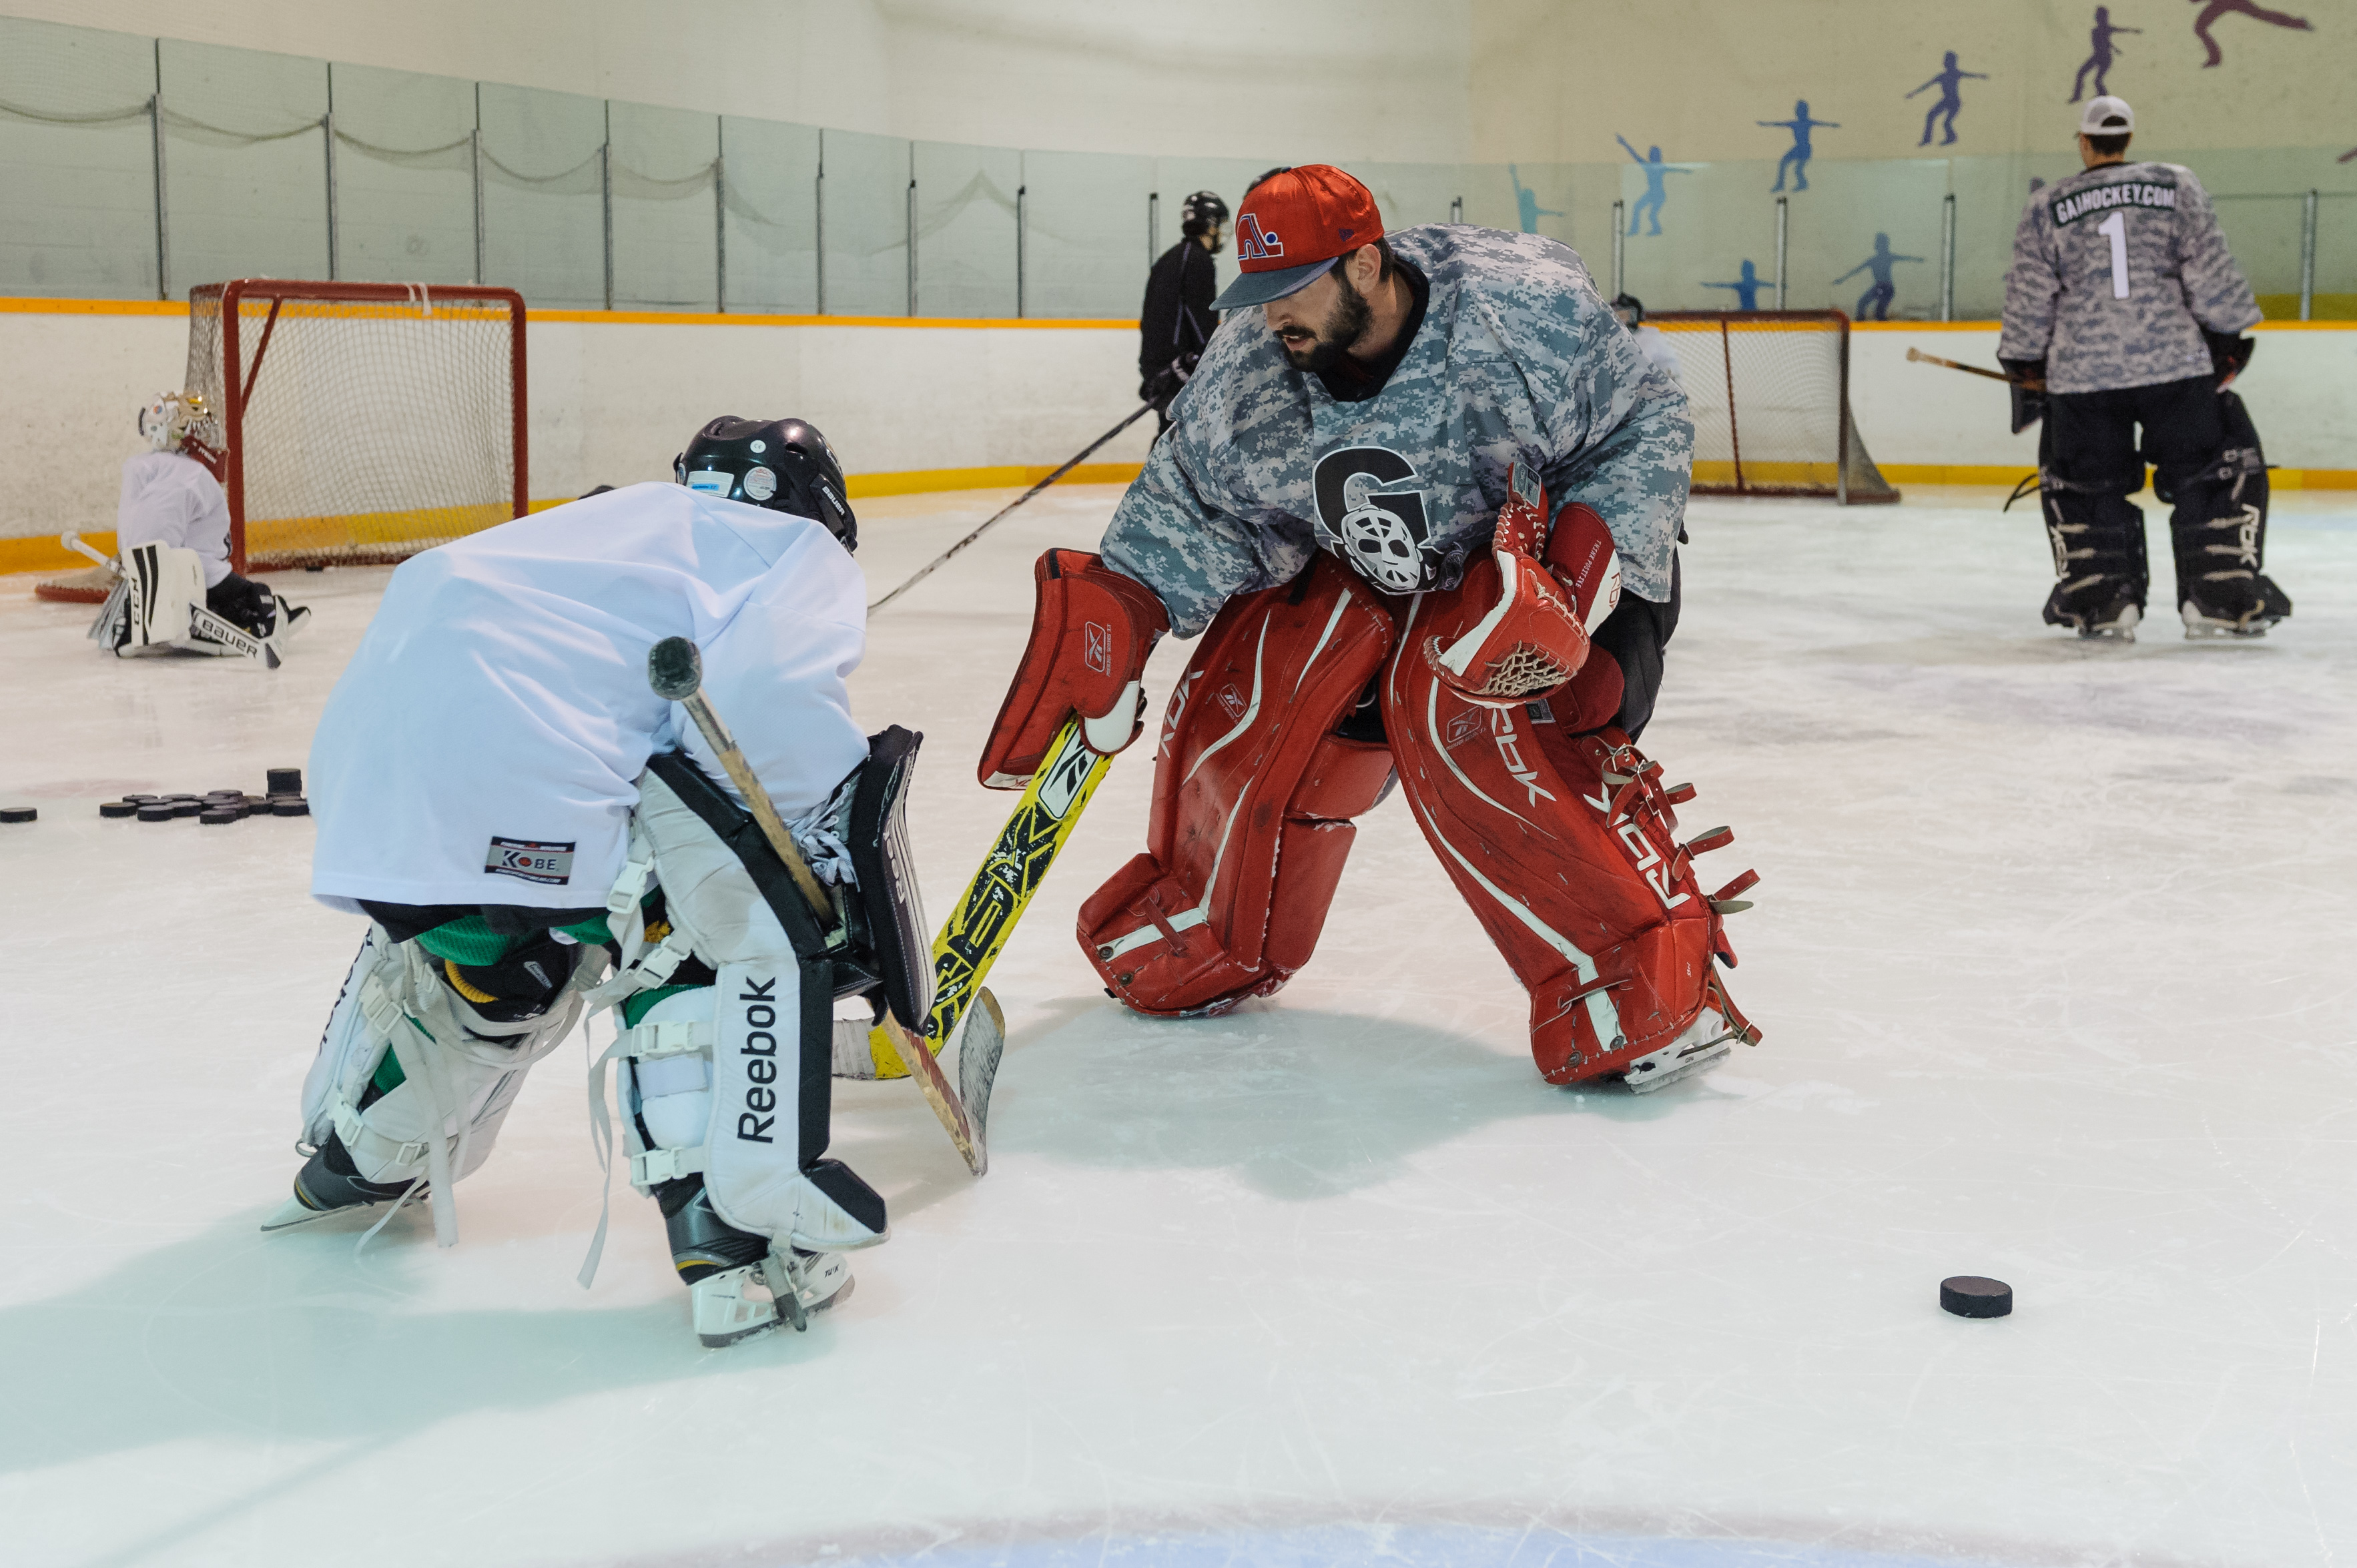 2016 17 Goalie Training Gaahockey Elite Ottawa Goalie Training